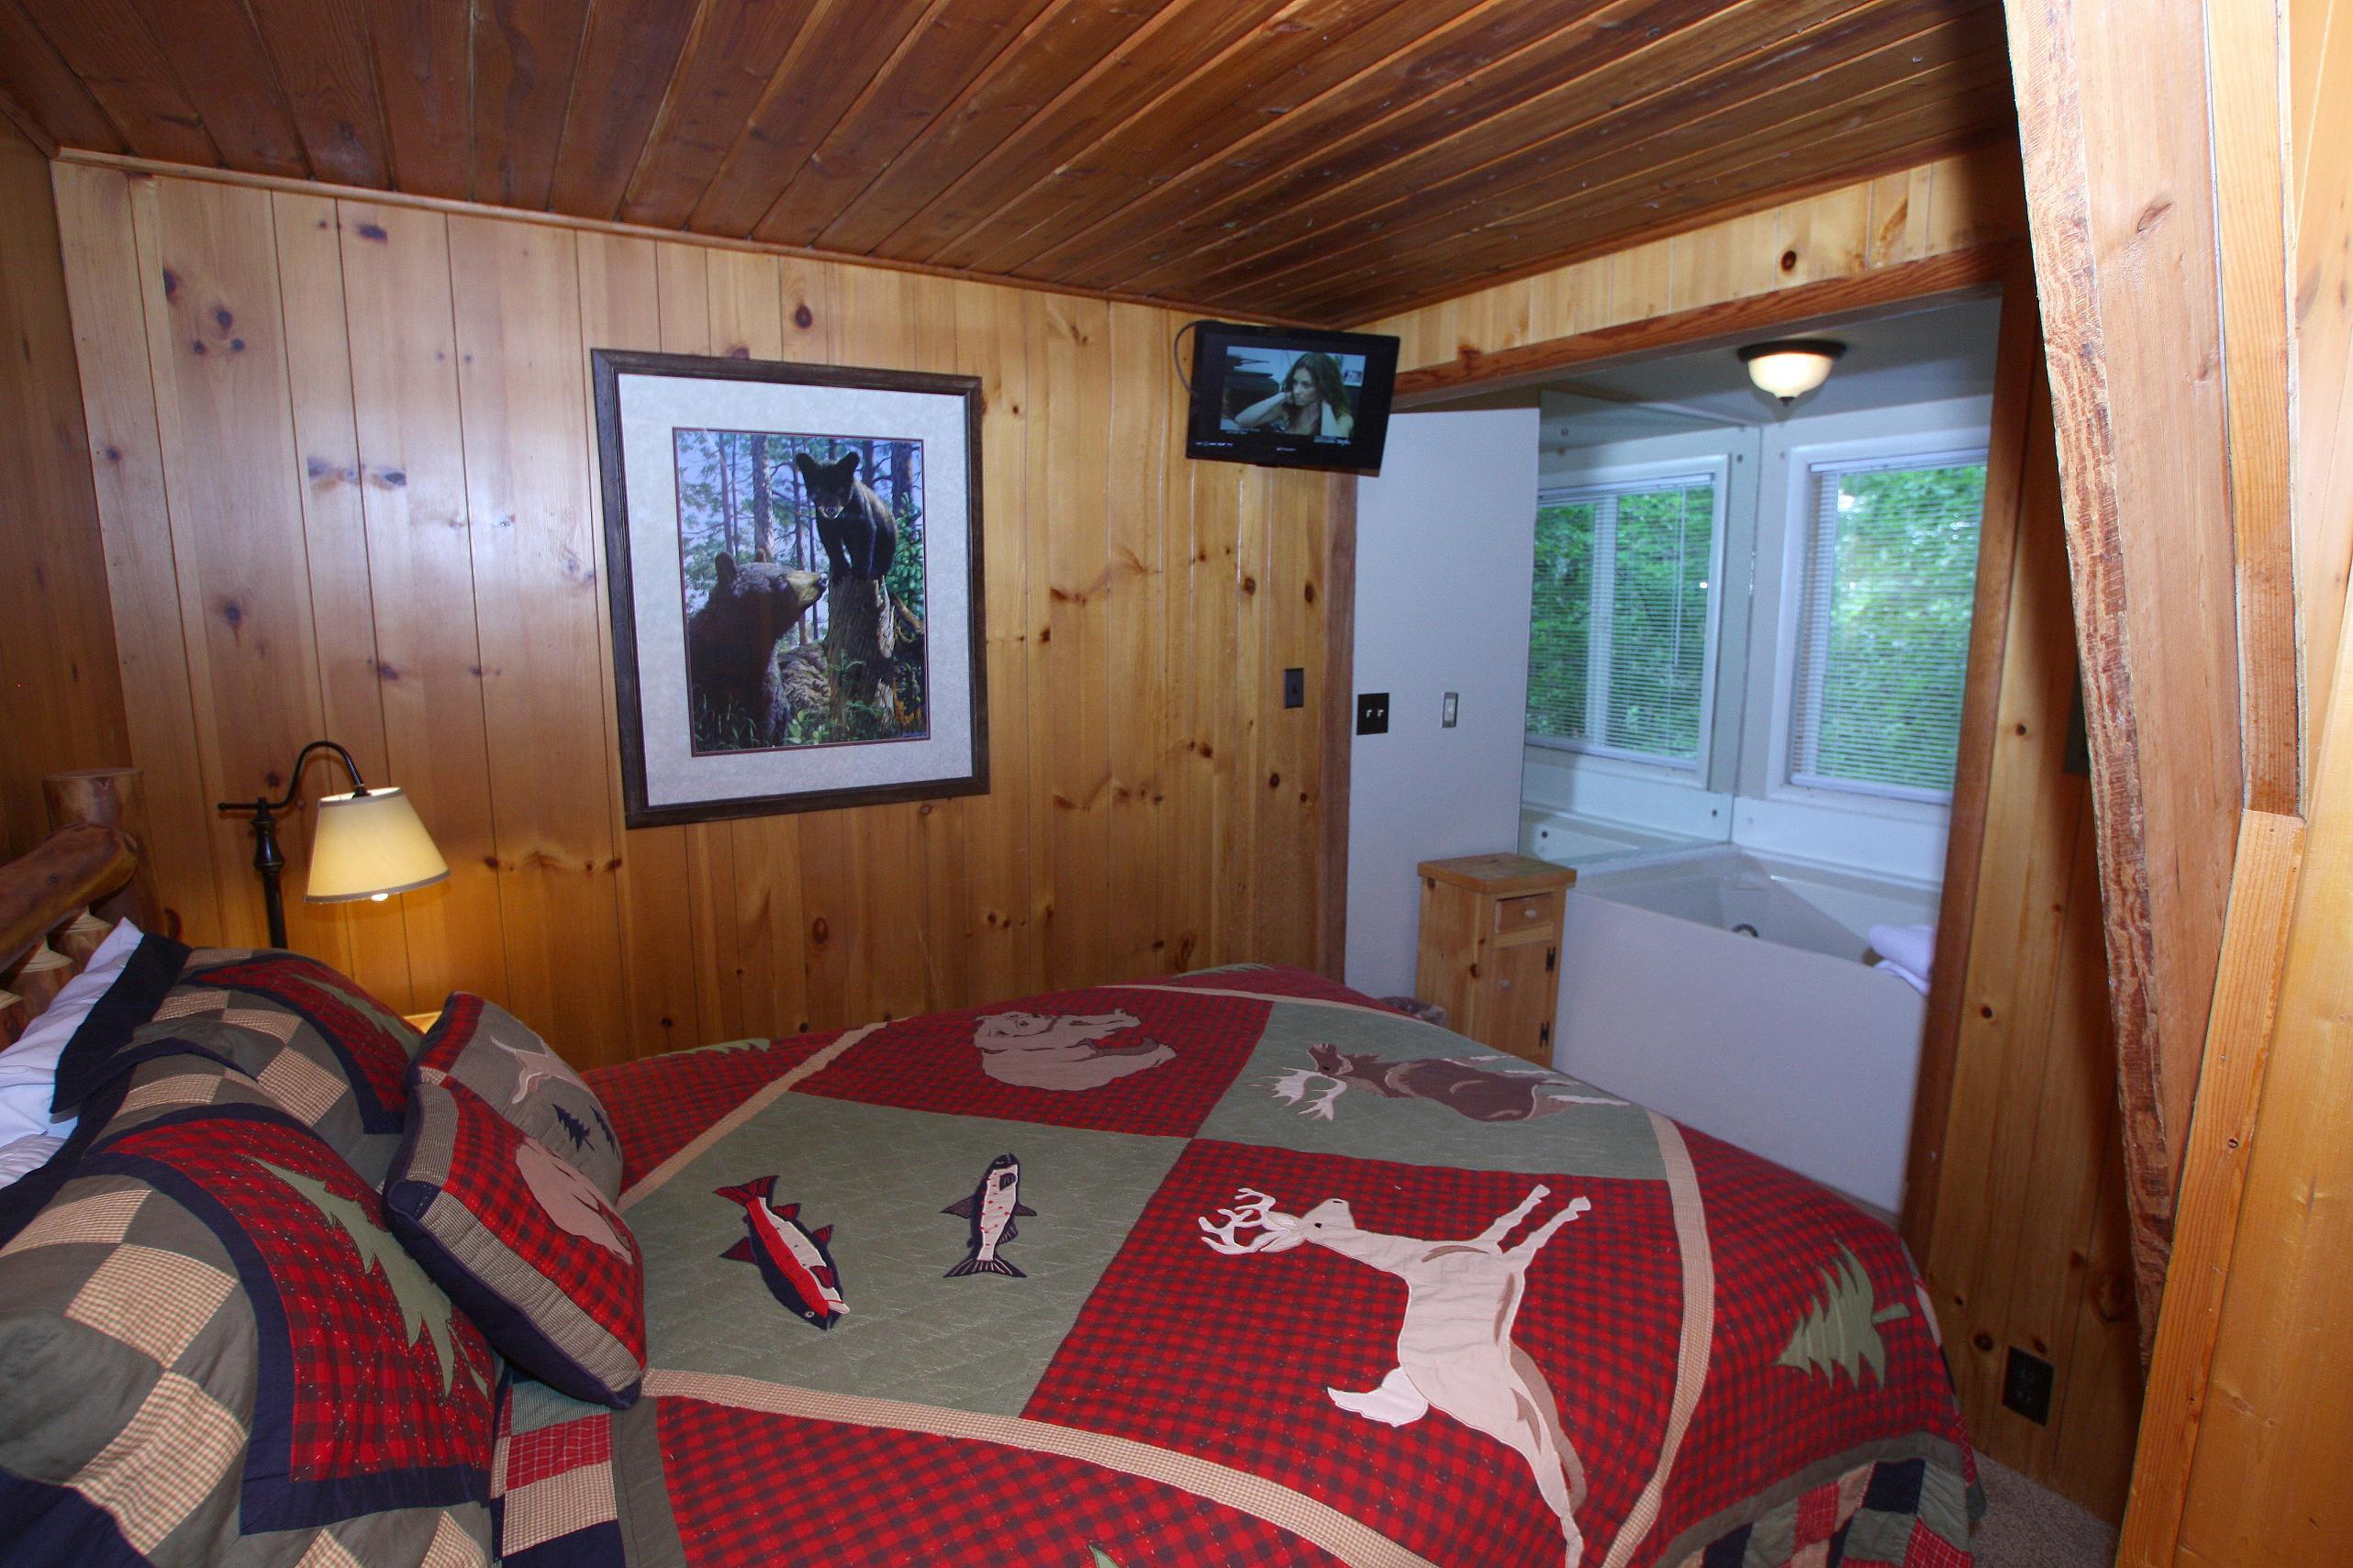 one bedroom cabins in gatlinburg tn pinetop a 1 bedroom cabin in gatlinburg tennessee pinetop a 1 bedroom cabin in gatlinburg tennessee